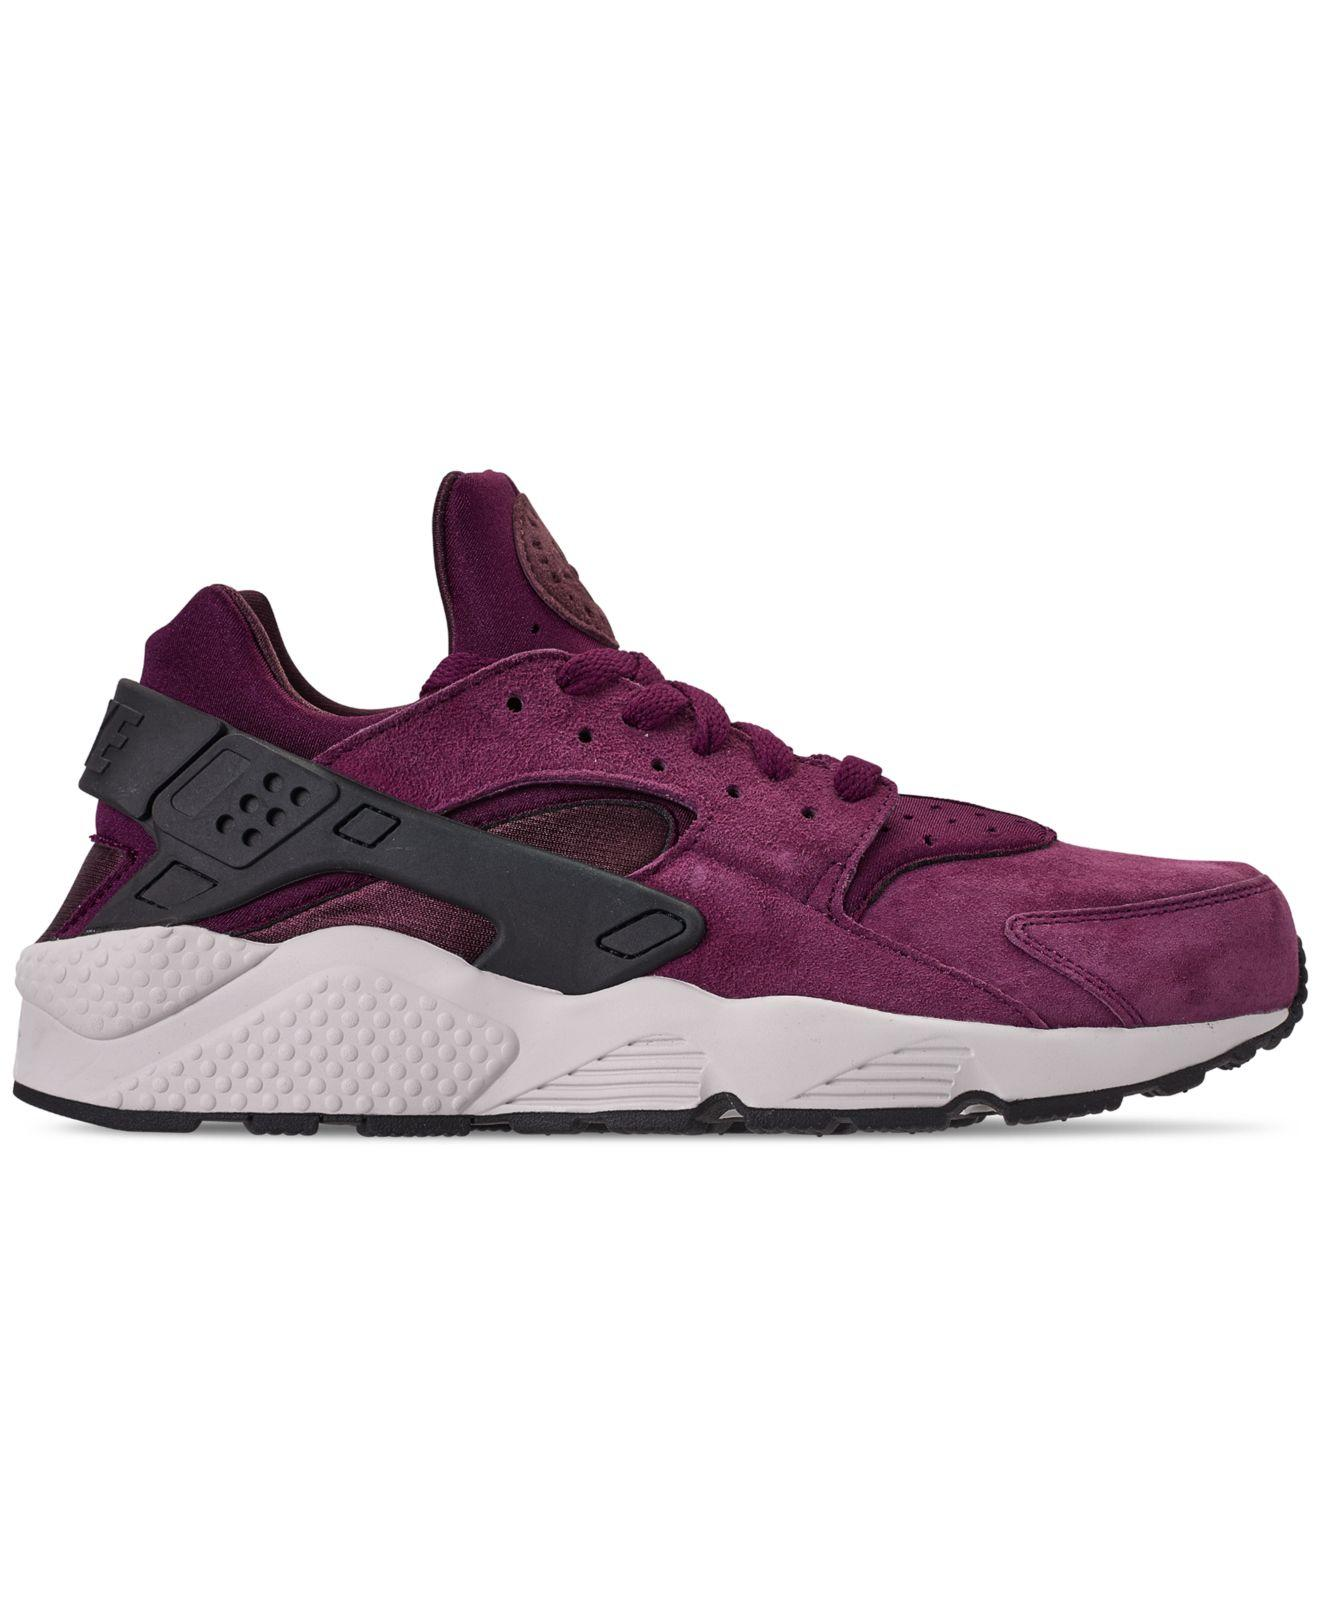 a9a0b7b7bc4b6 Lyst - Nike Air Huarache Run Premium Running Sneakers From Finish Line in  Purple for Men